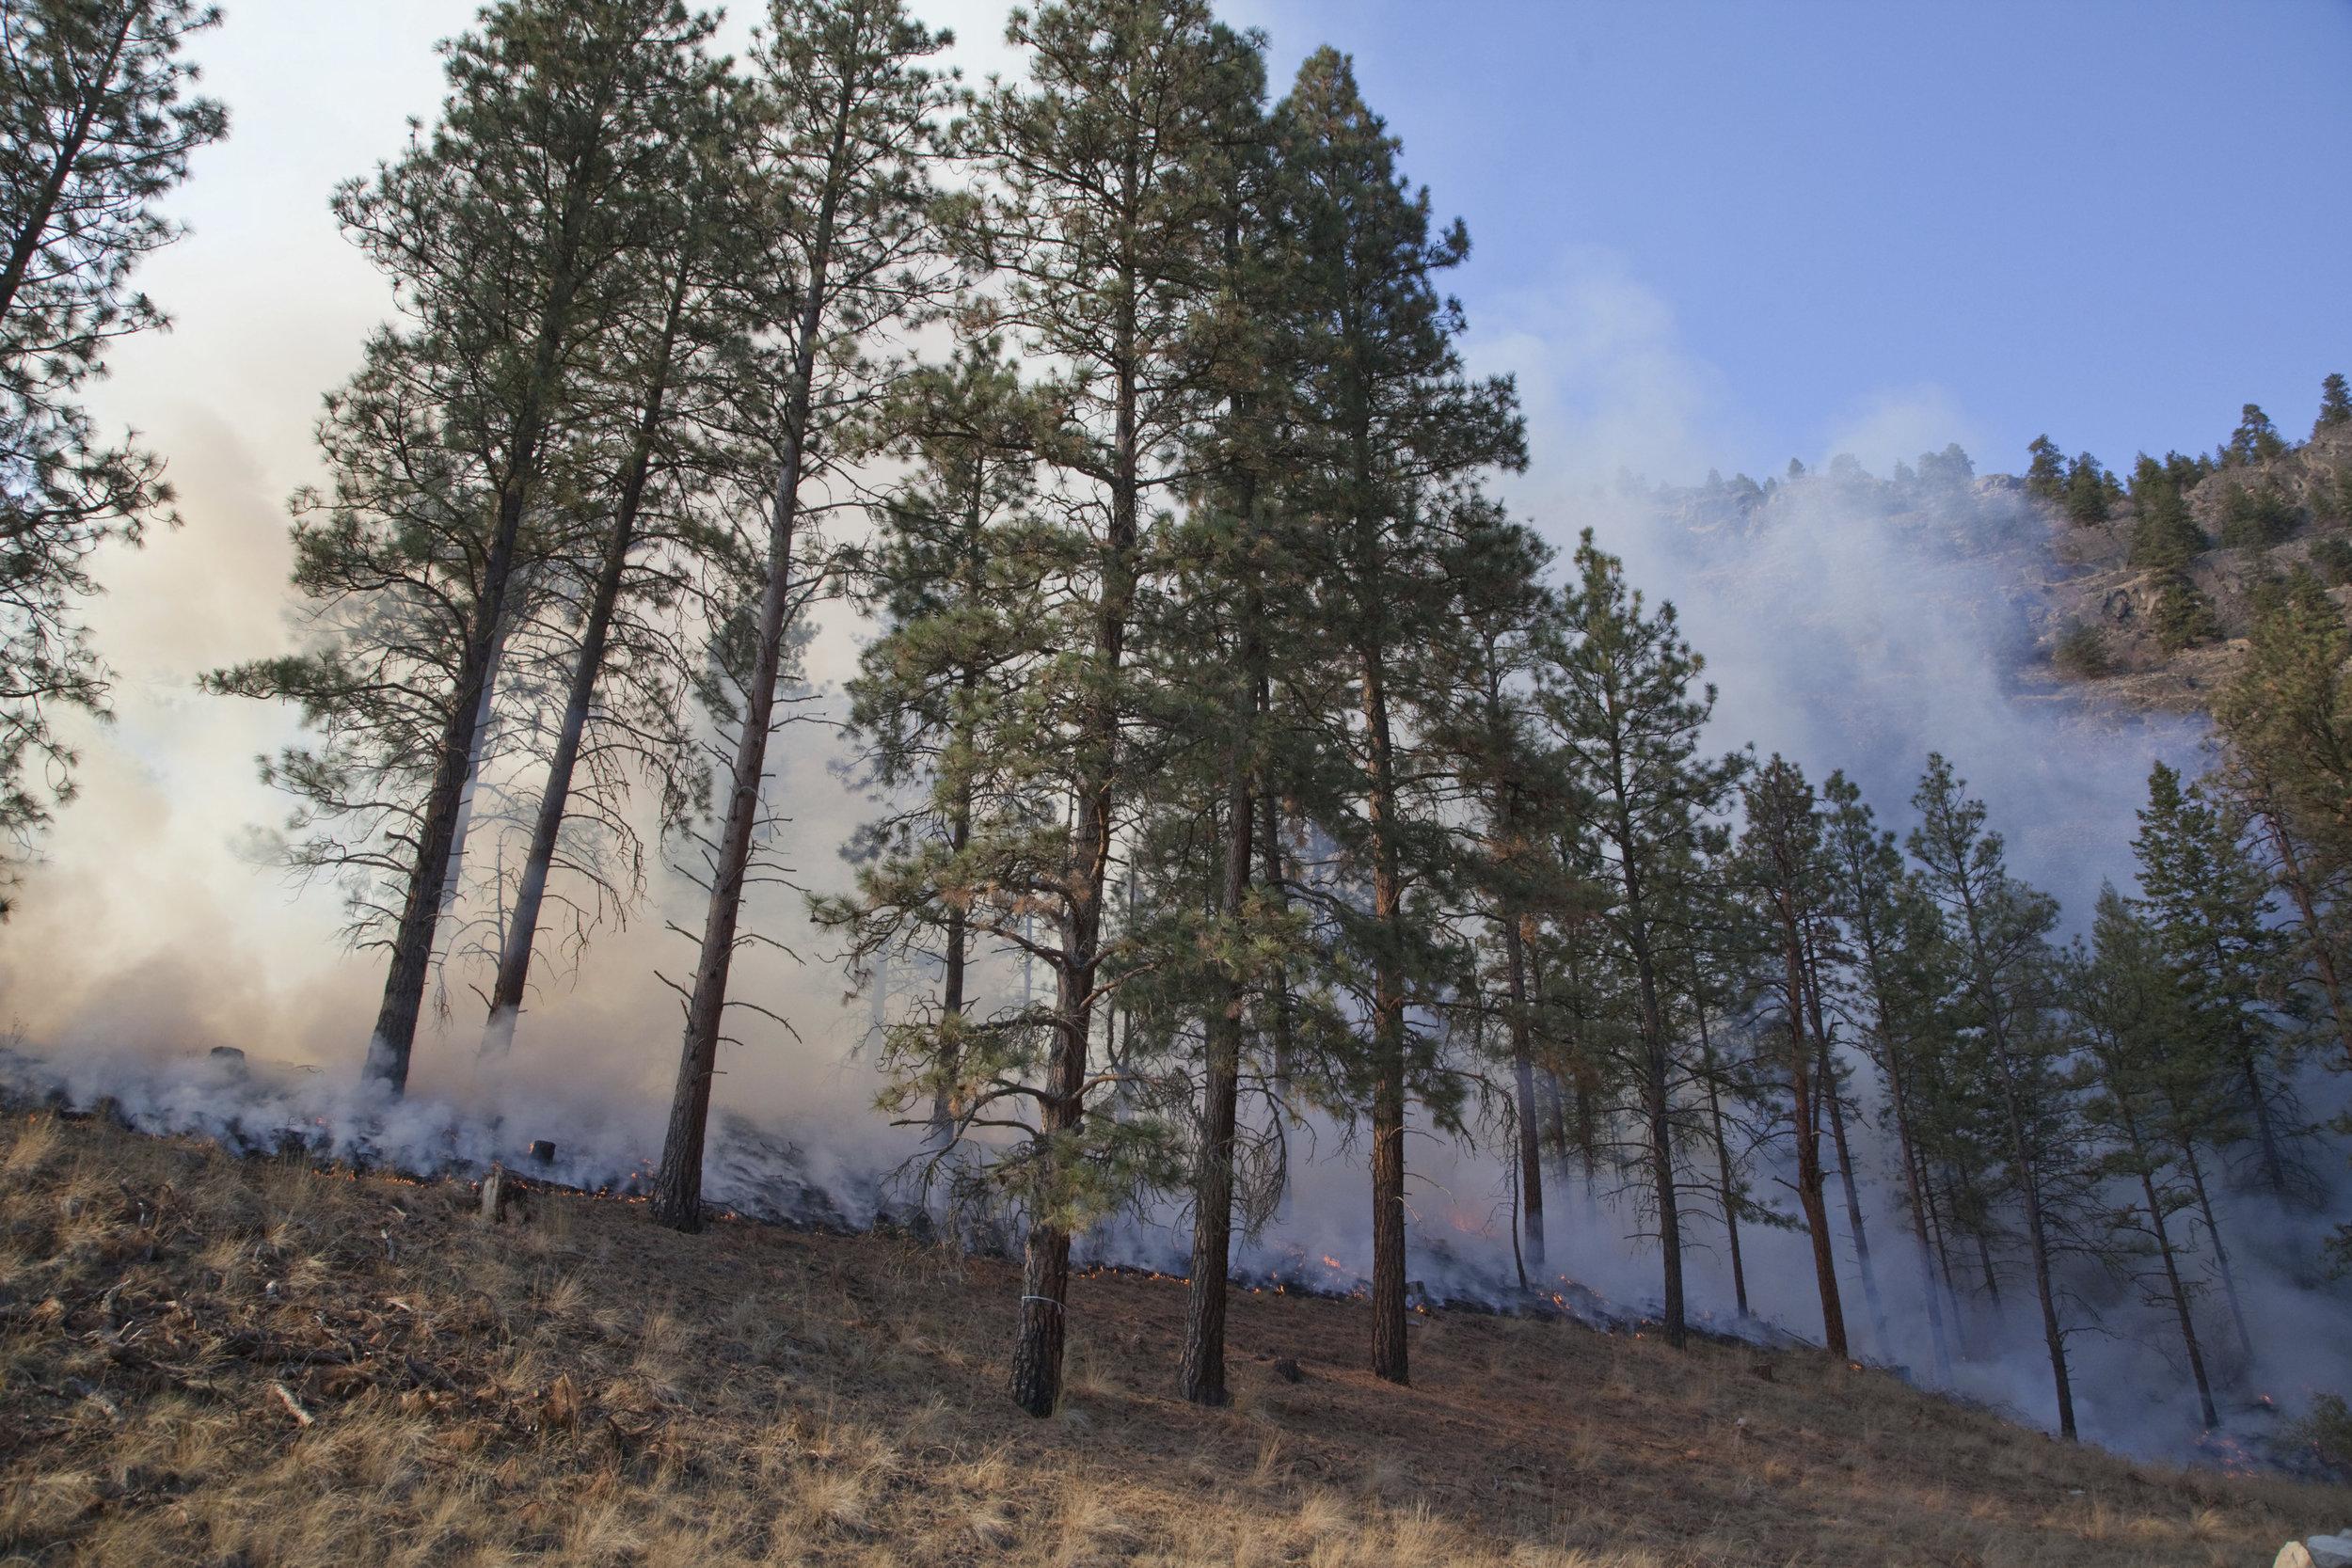 Prescribed fire in ponderosa pine forest in fall, on Sinlahekin Wildlife Area in Okanogan County. Photo © John Marshall